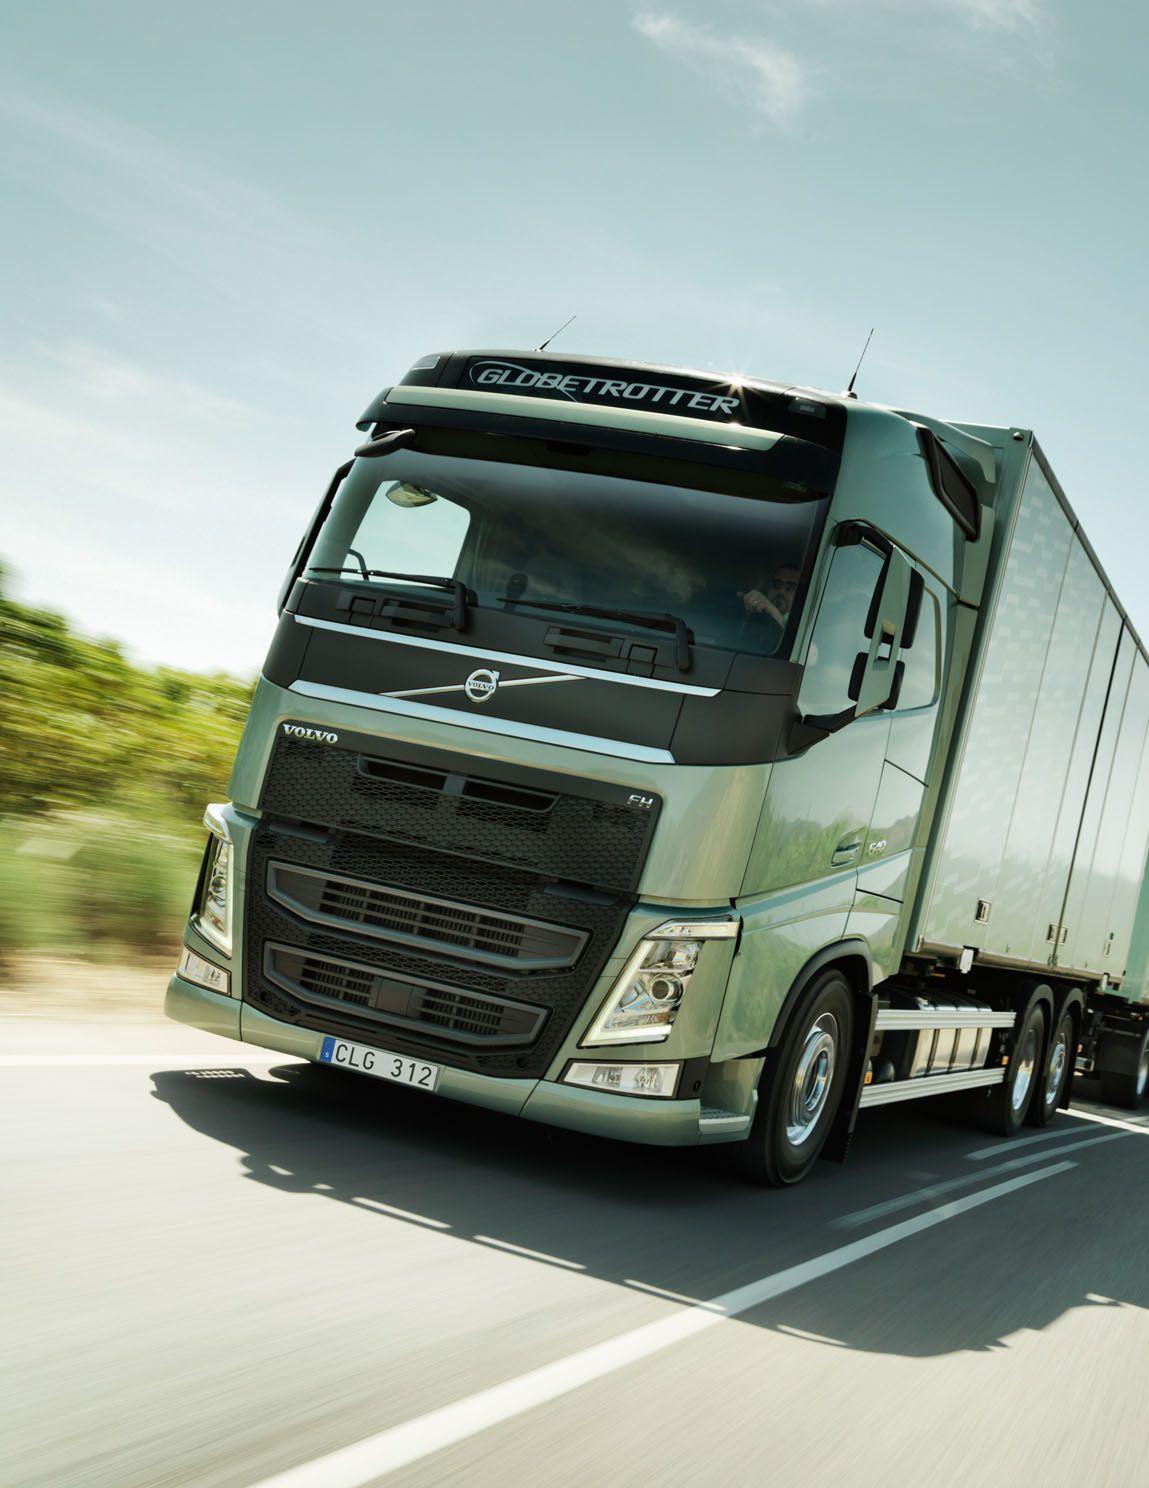 Volvo fh volvo fh pinterest for Produktdesign fh